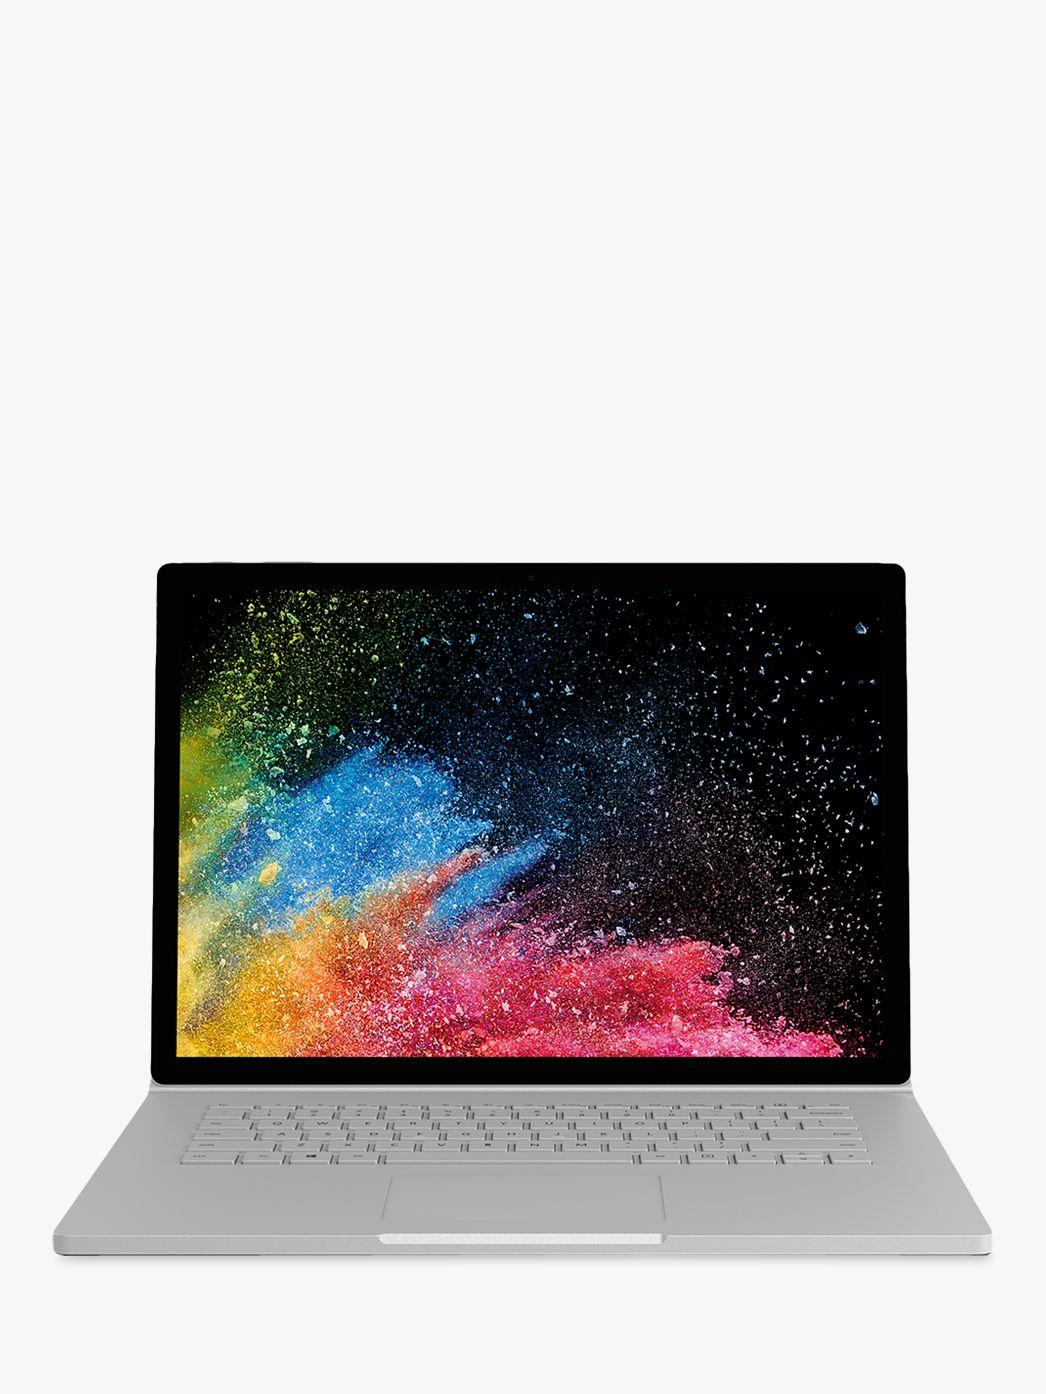 "Microsoft Microsoft Surface Book 2, Intel Core i7, 16GB RAM, 1TB SSD, 15"", PixelSense Display, GeForce GTX 1060, Silver"